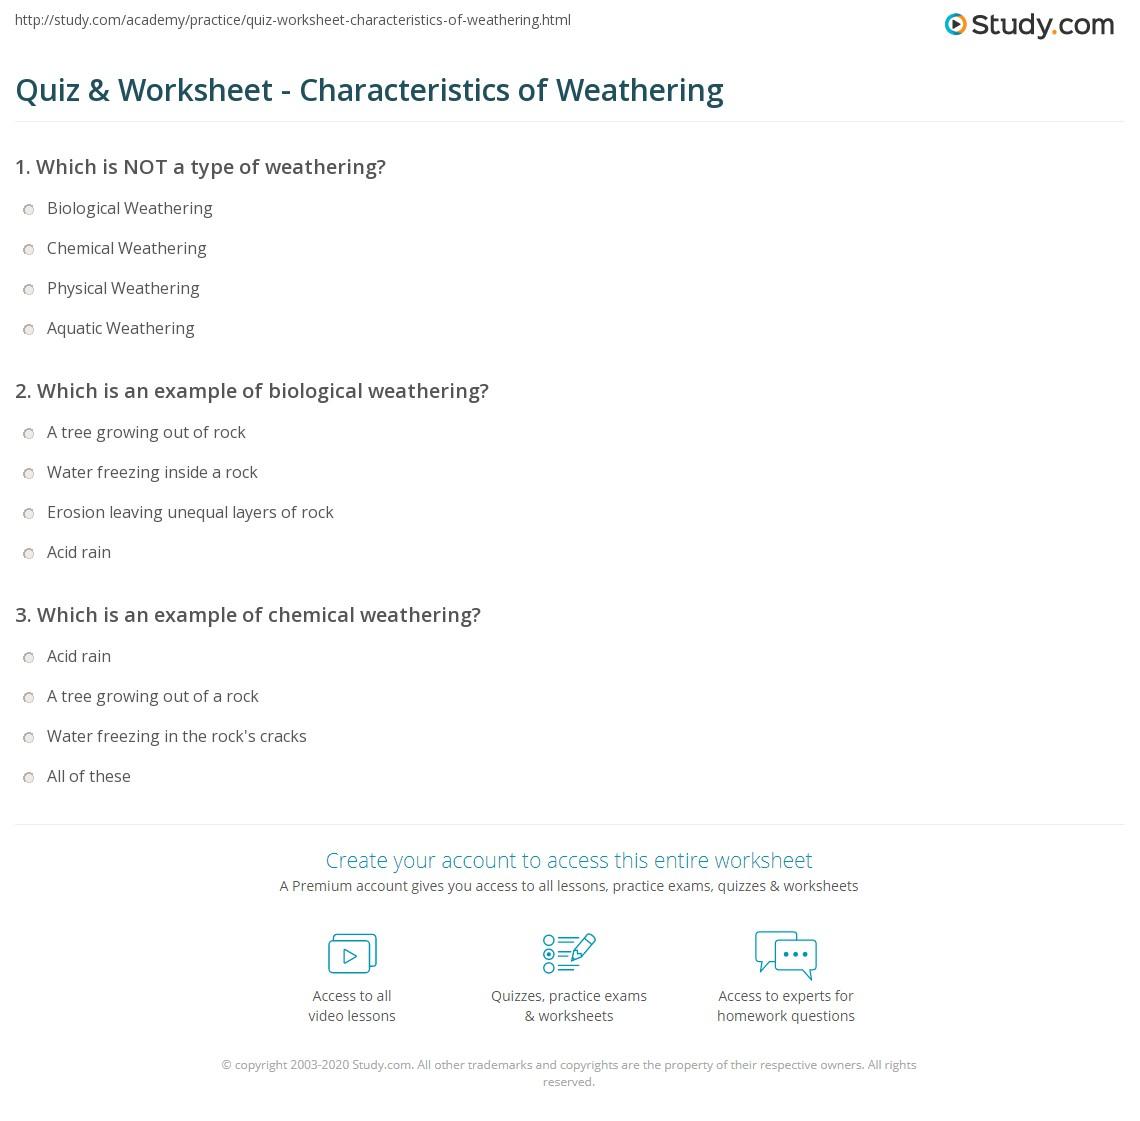 Quiz & Worksheet - Characteristics of Weathering | Study.com